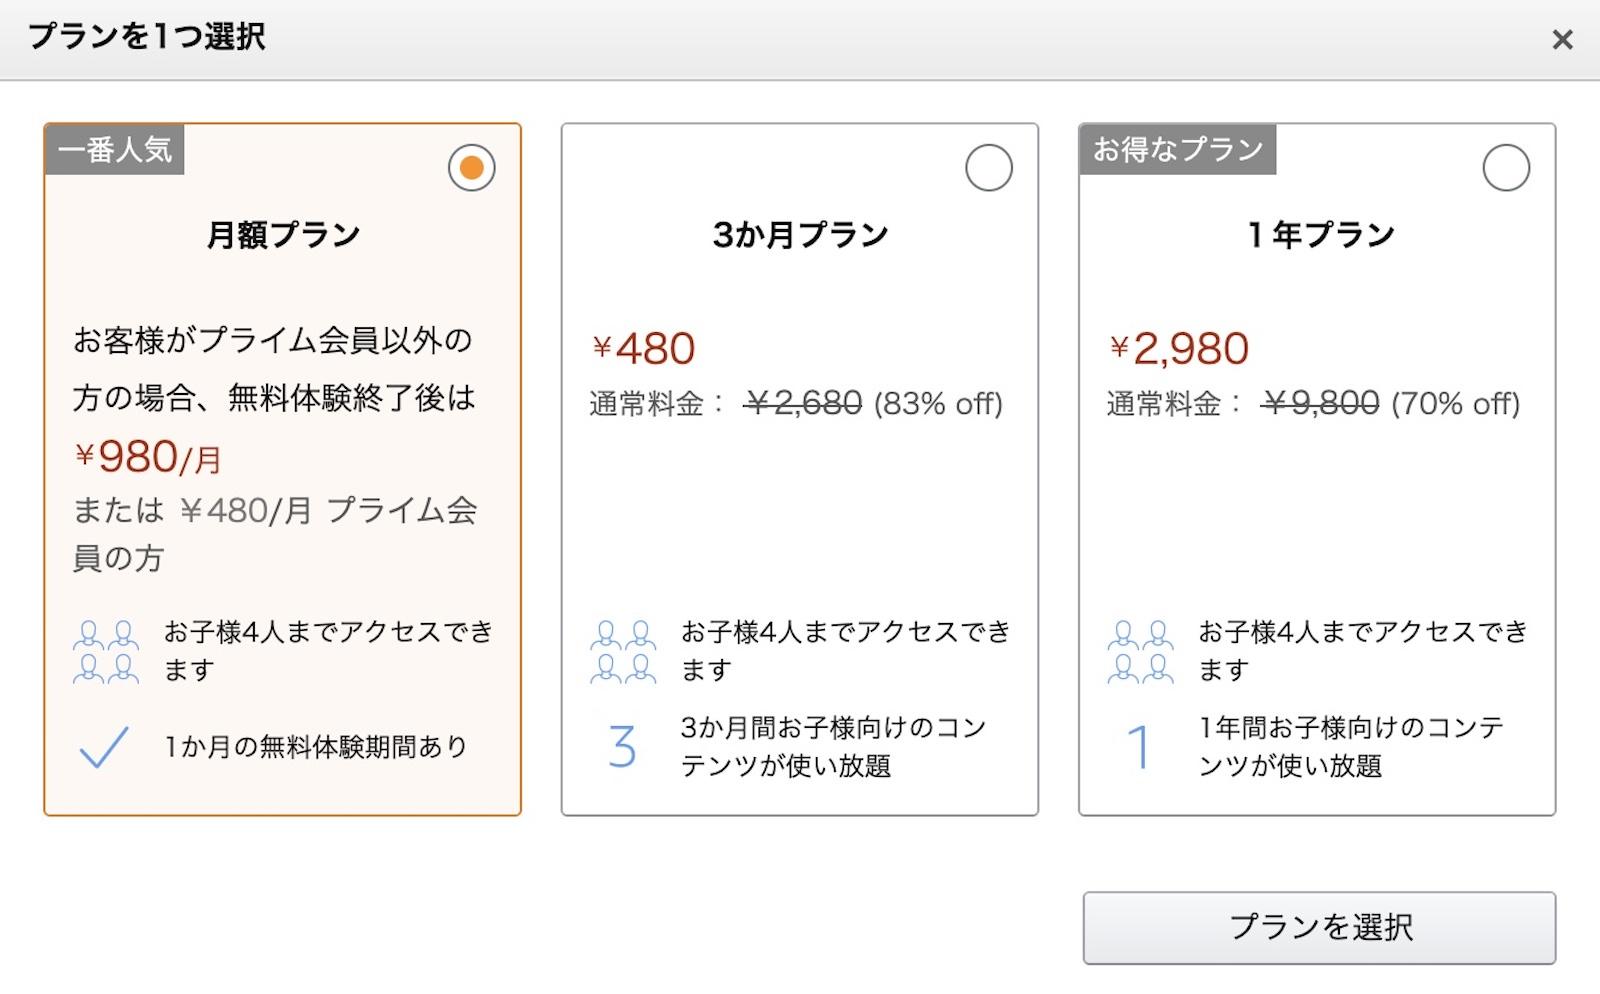 Amazon Kids Campaign summer discount 2